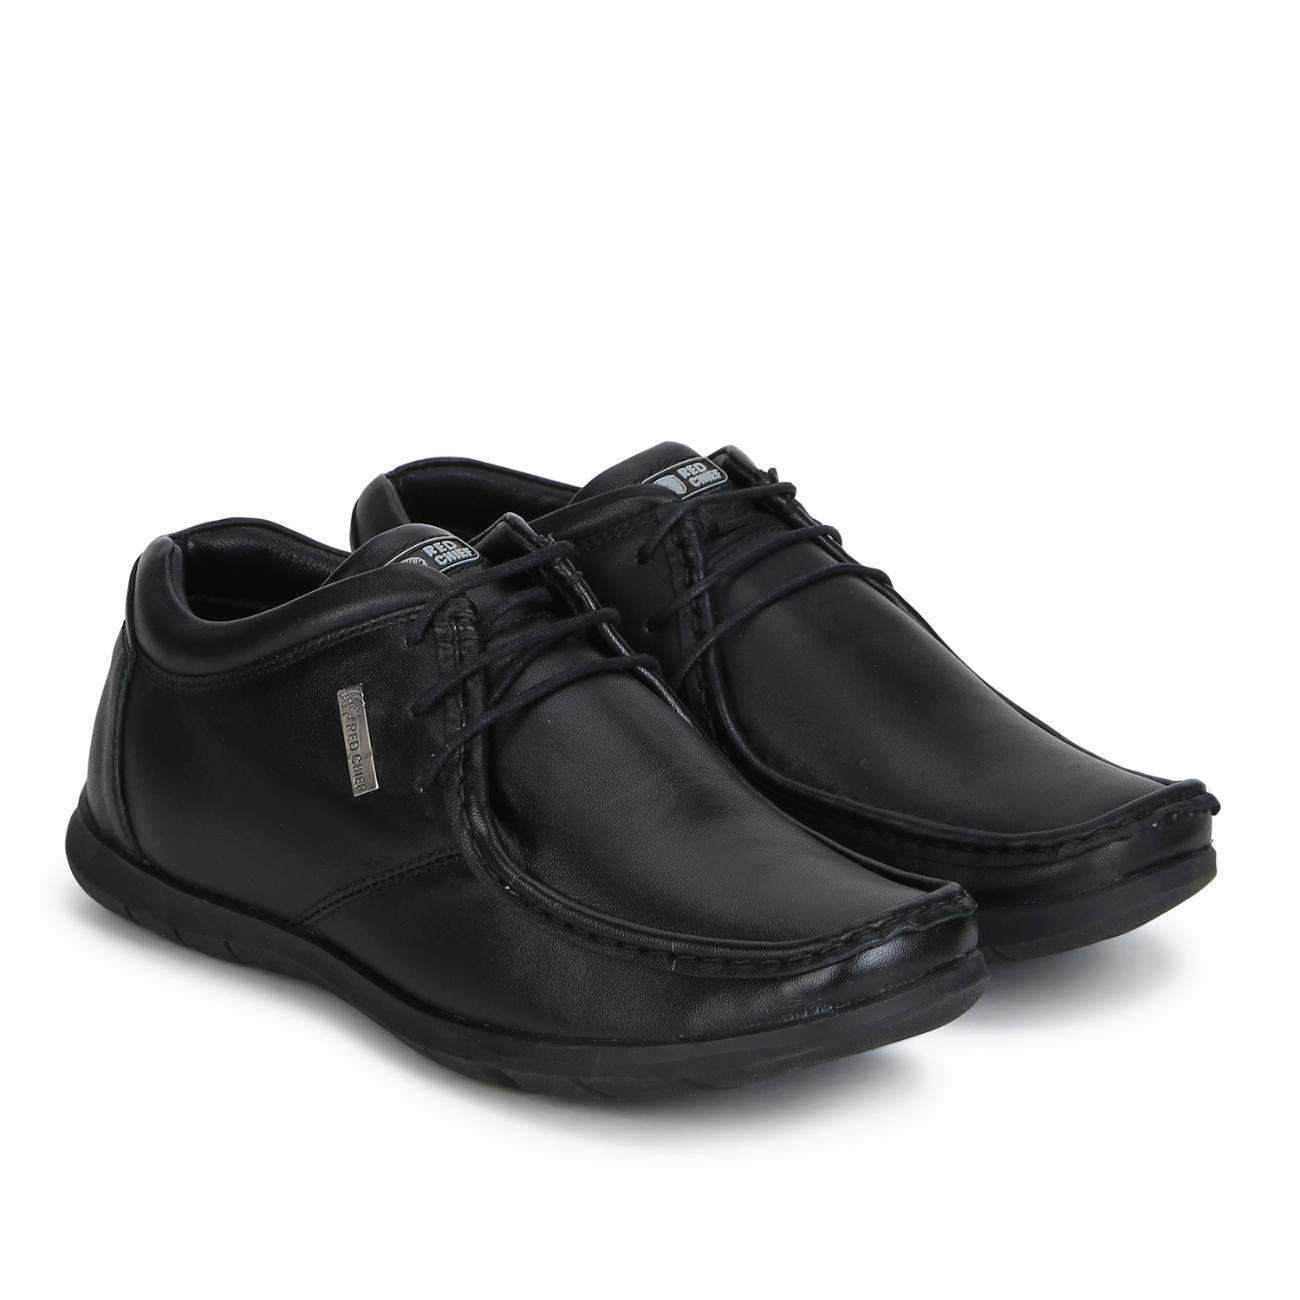 black original leather lace up formal shoes